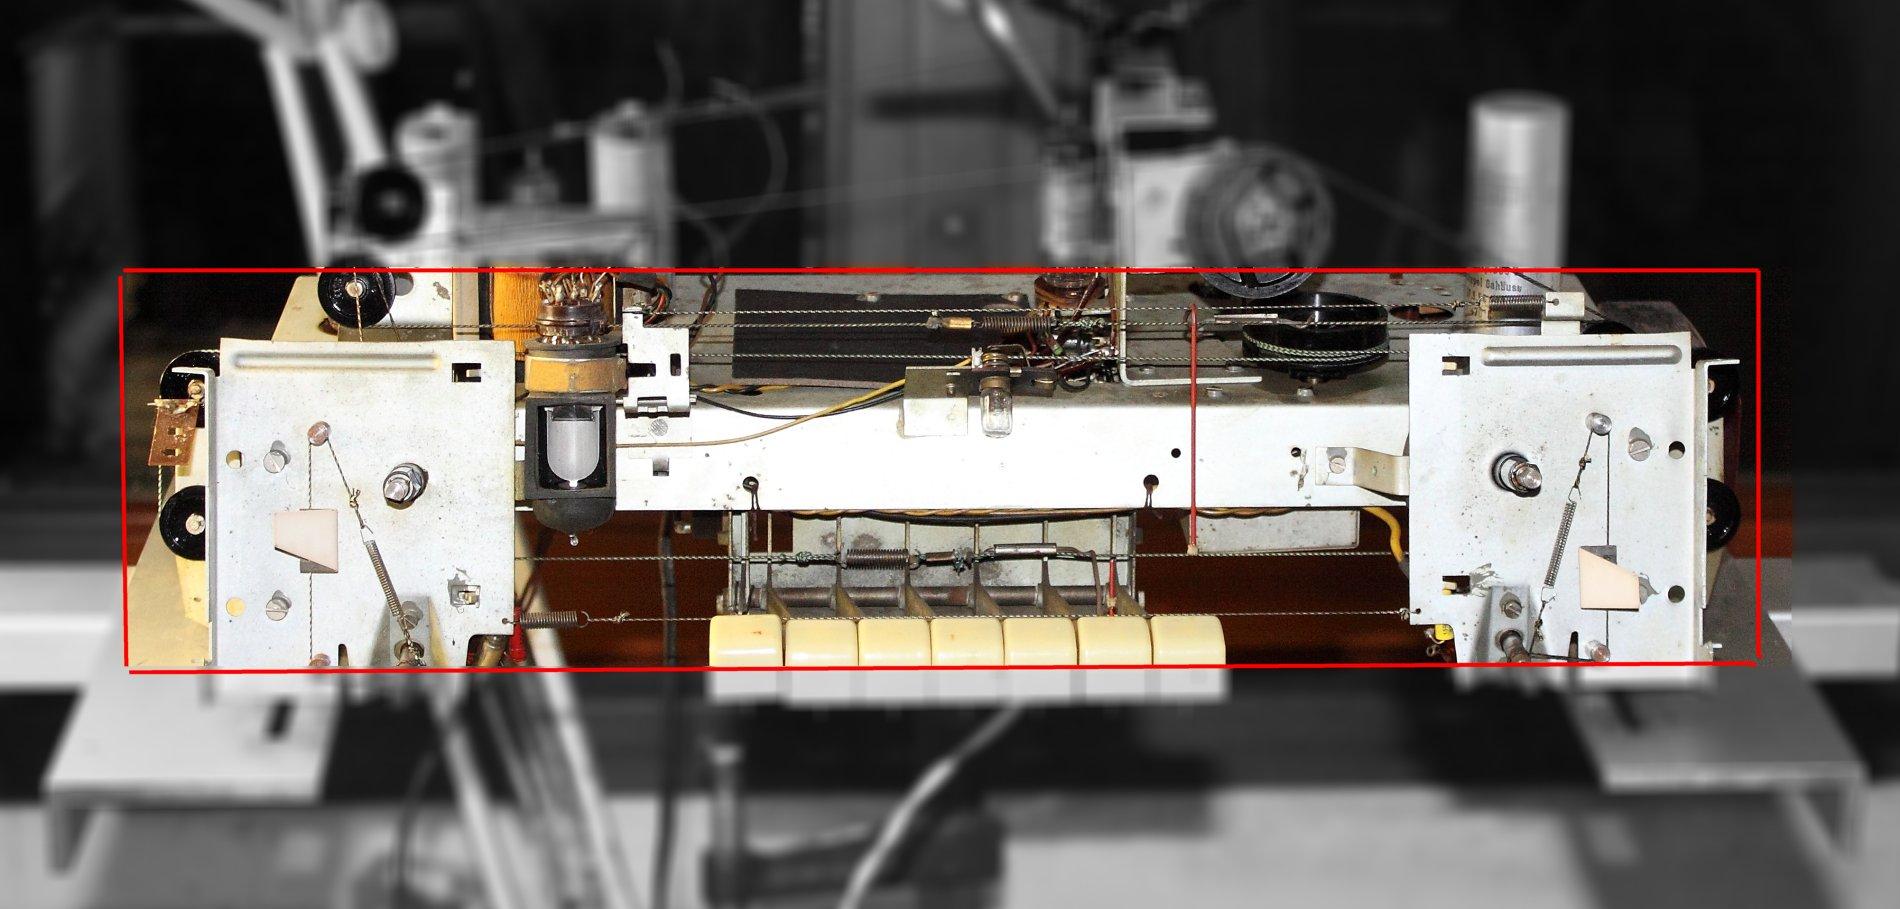 Siemens Meistersuper 843w